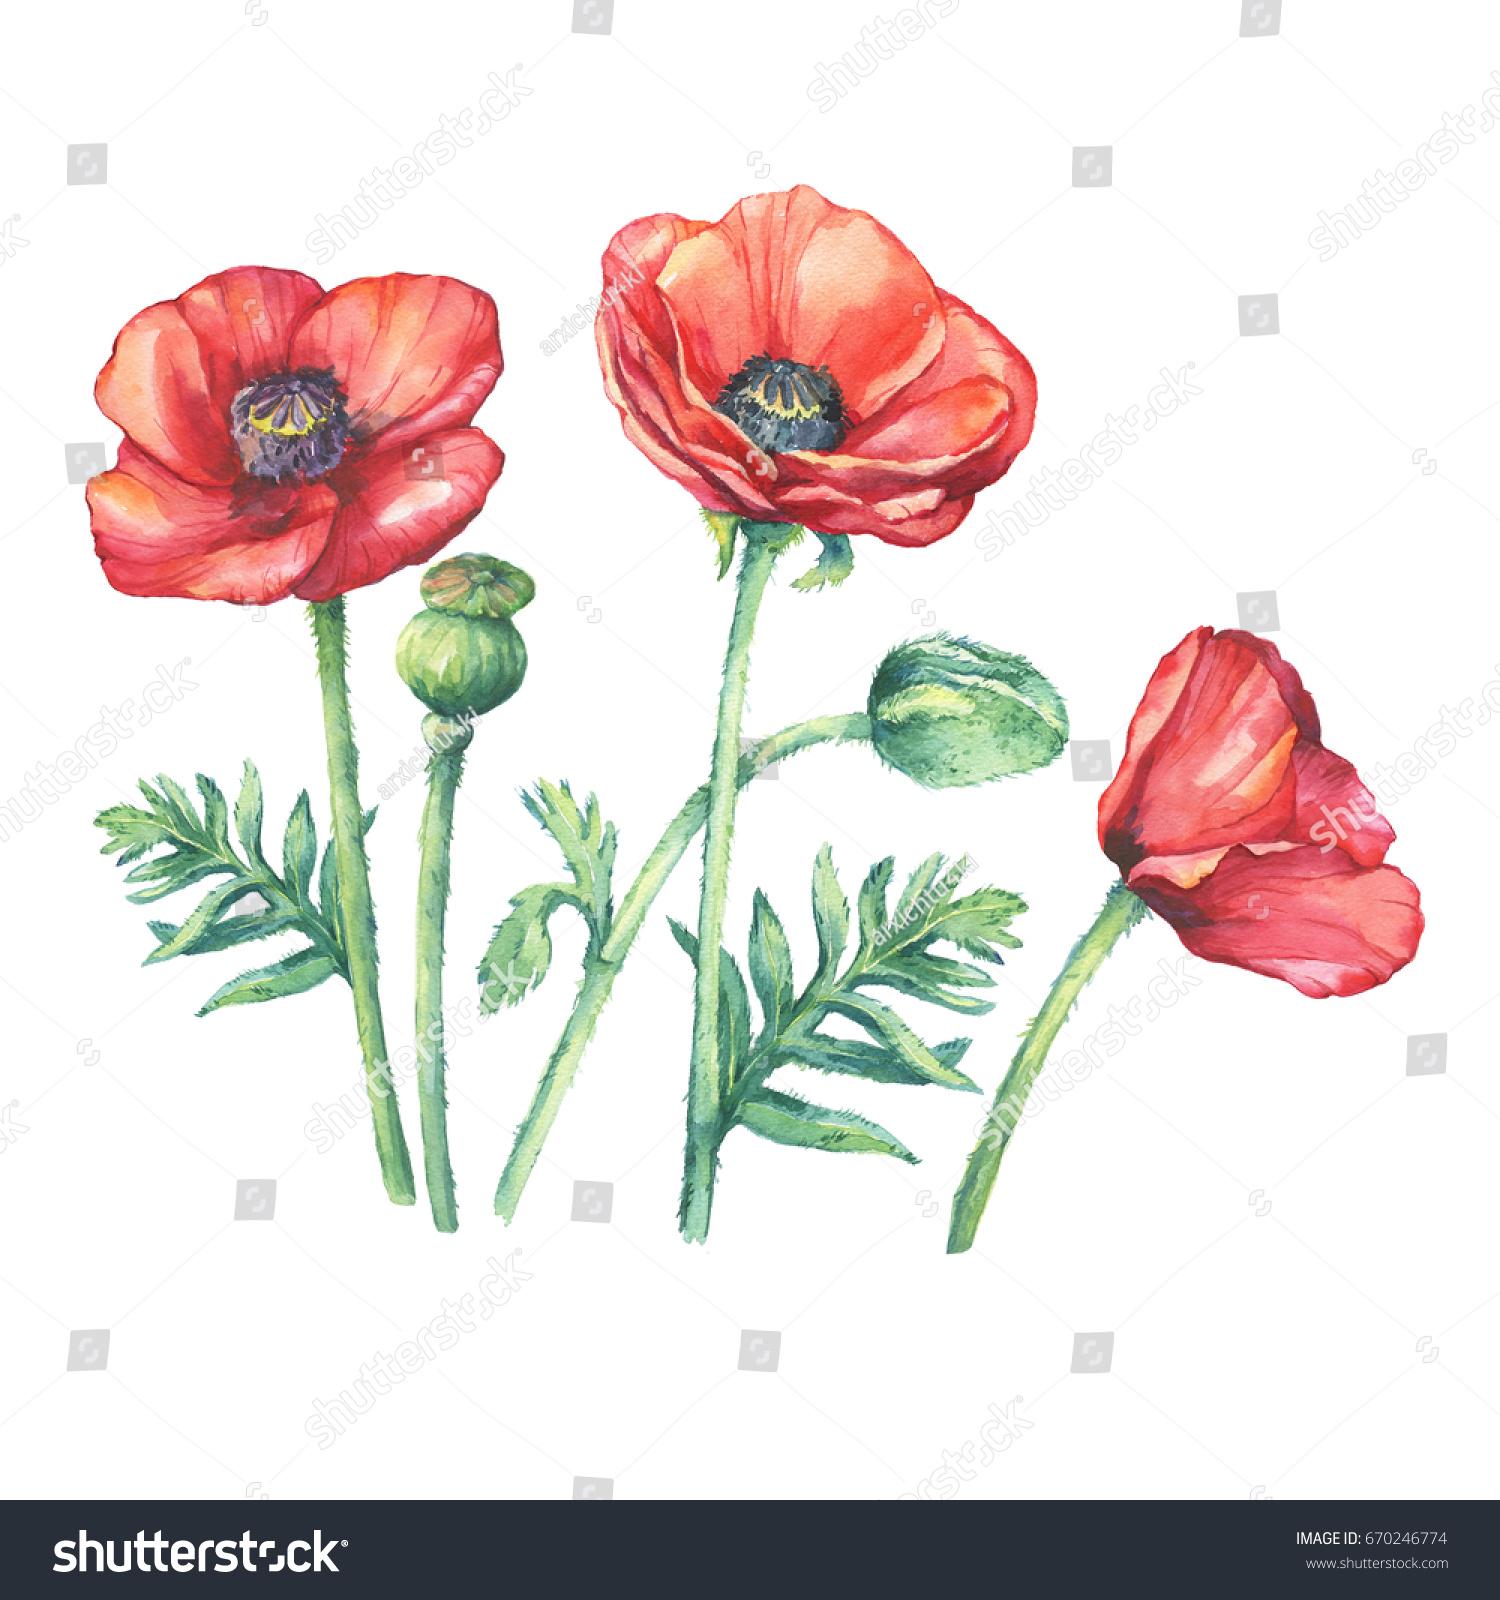 Set Flowering Red Poppies Flowers Papaver Stock Illustration